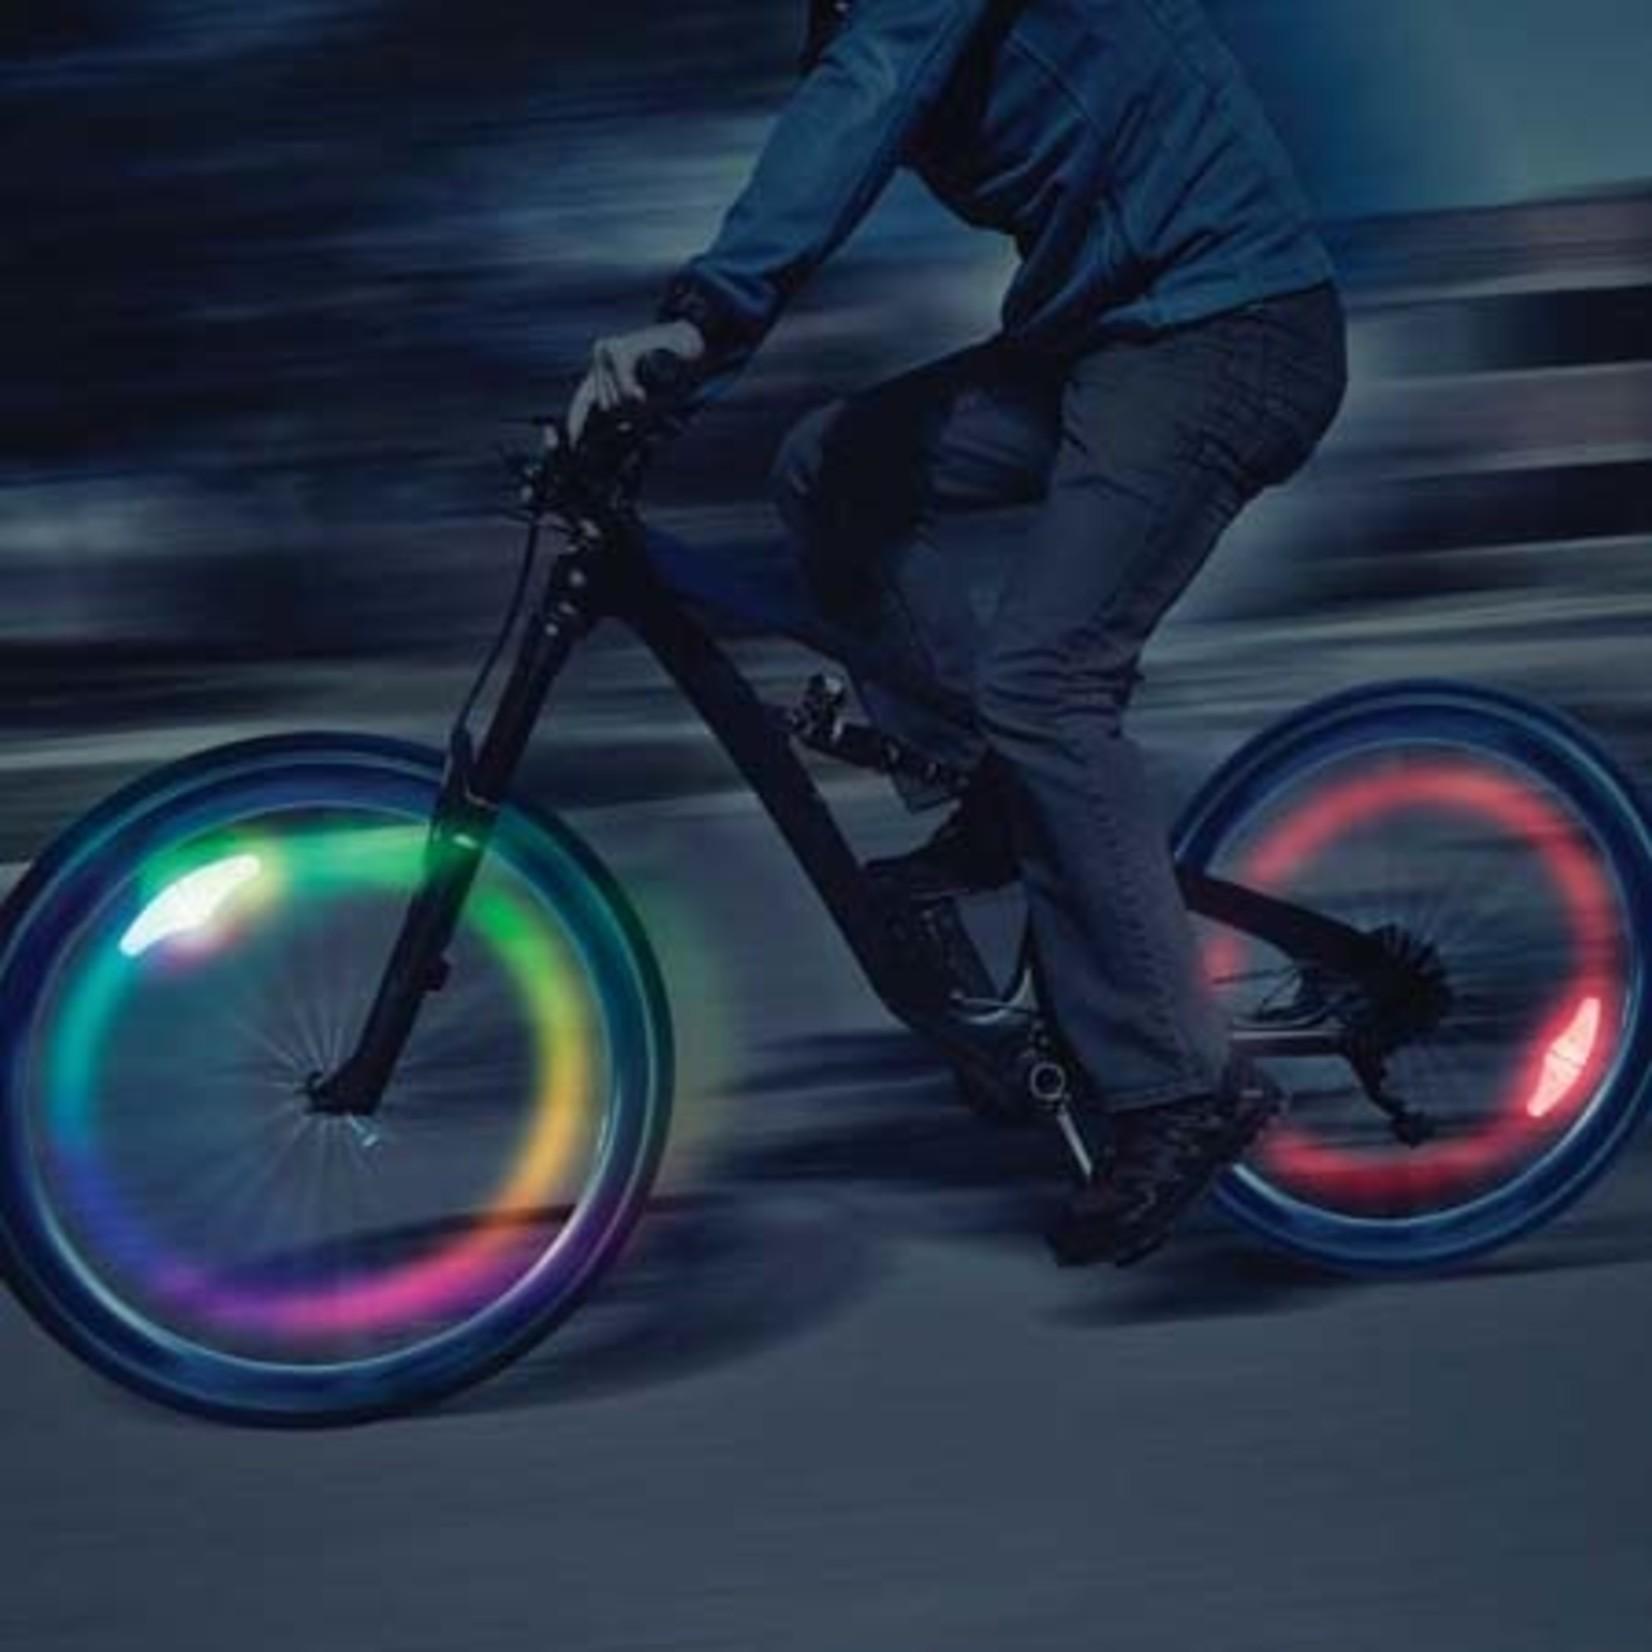 Nite Ize SpokeLit LED Disc-O Multicolour